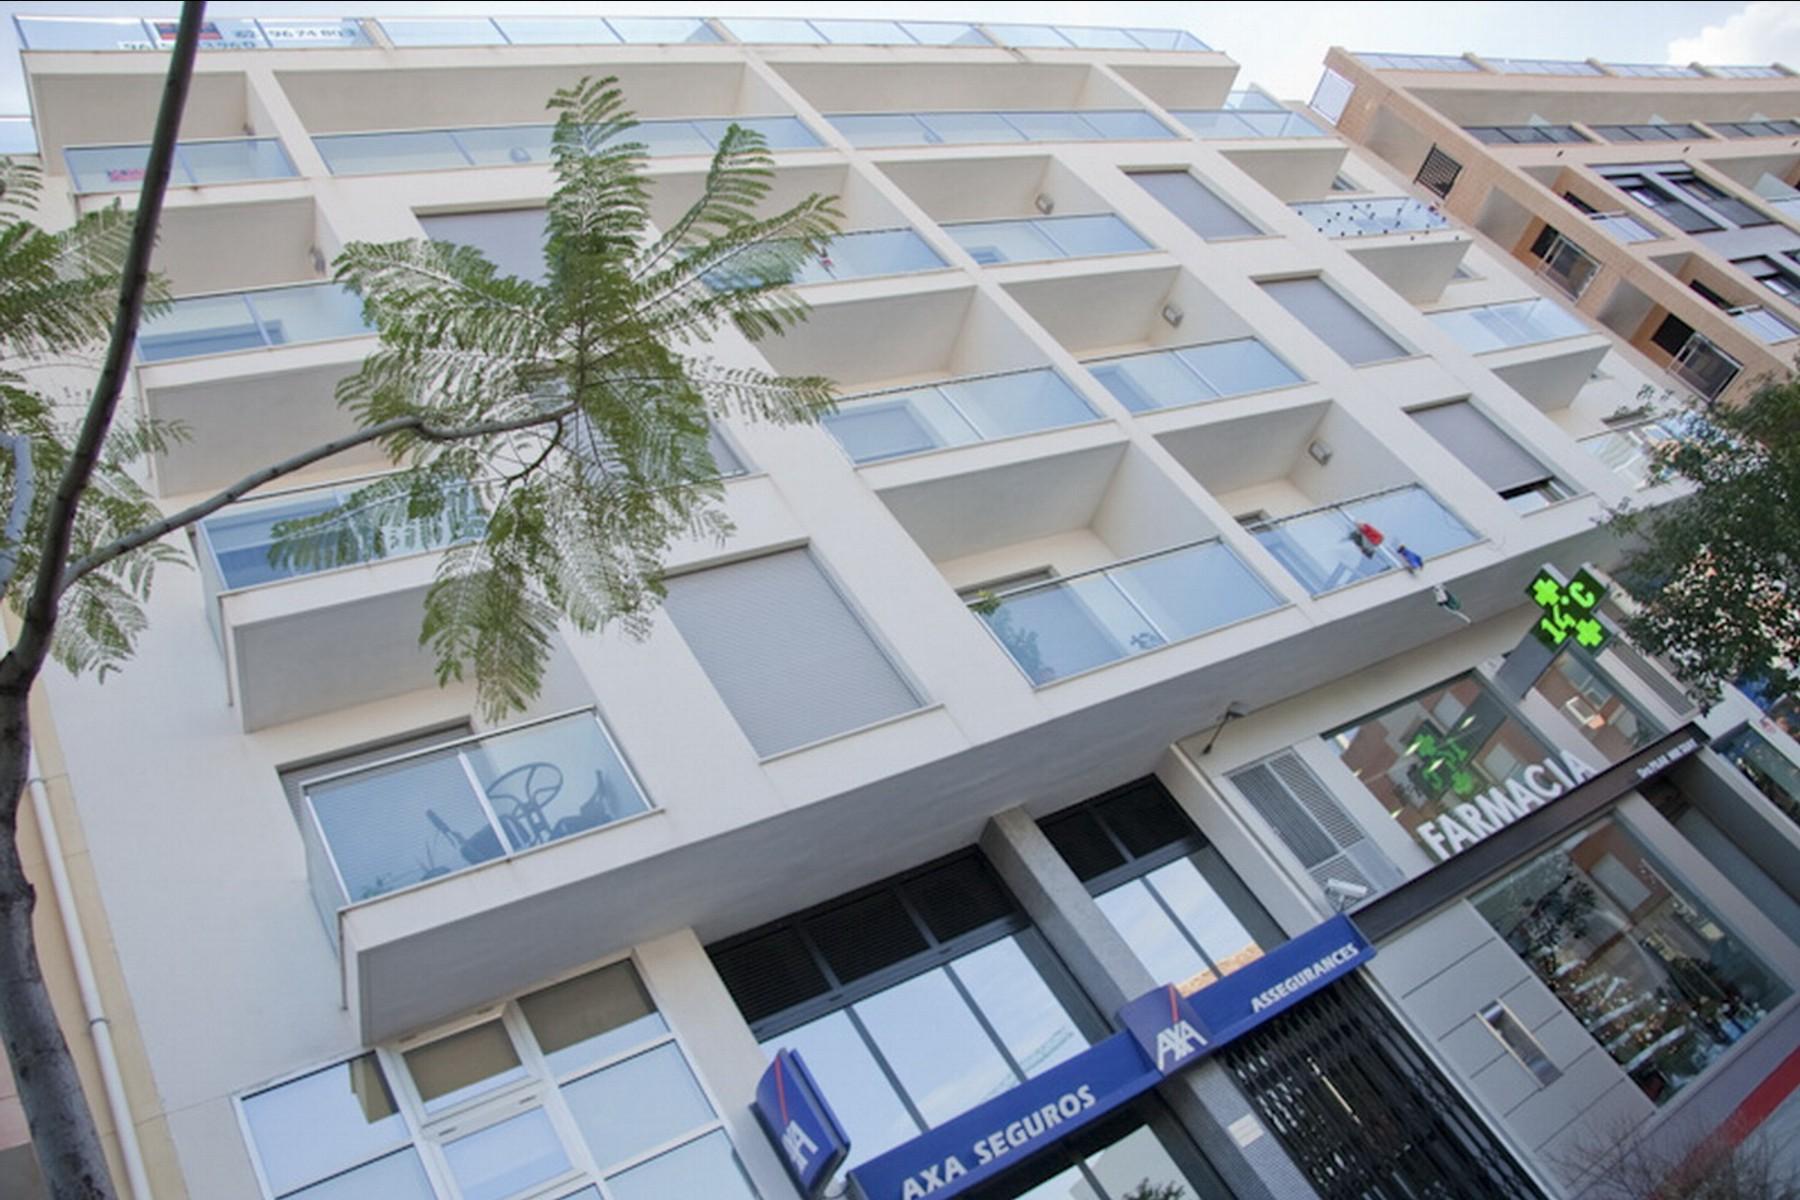 Imaginarq-042-edificio-viviendas.-Pego.-Alicante.03A